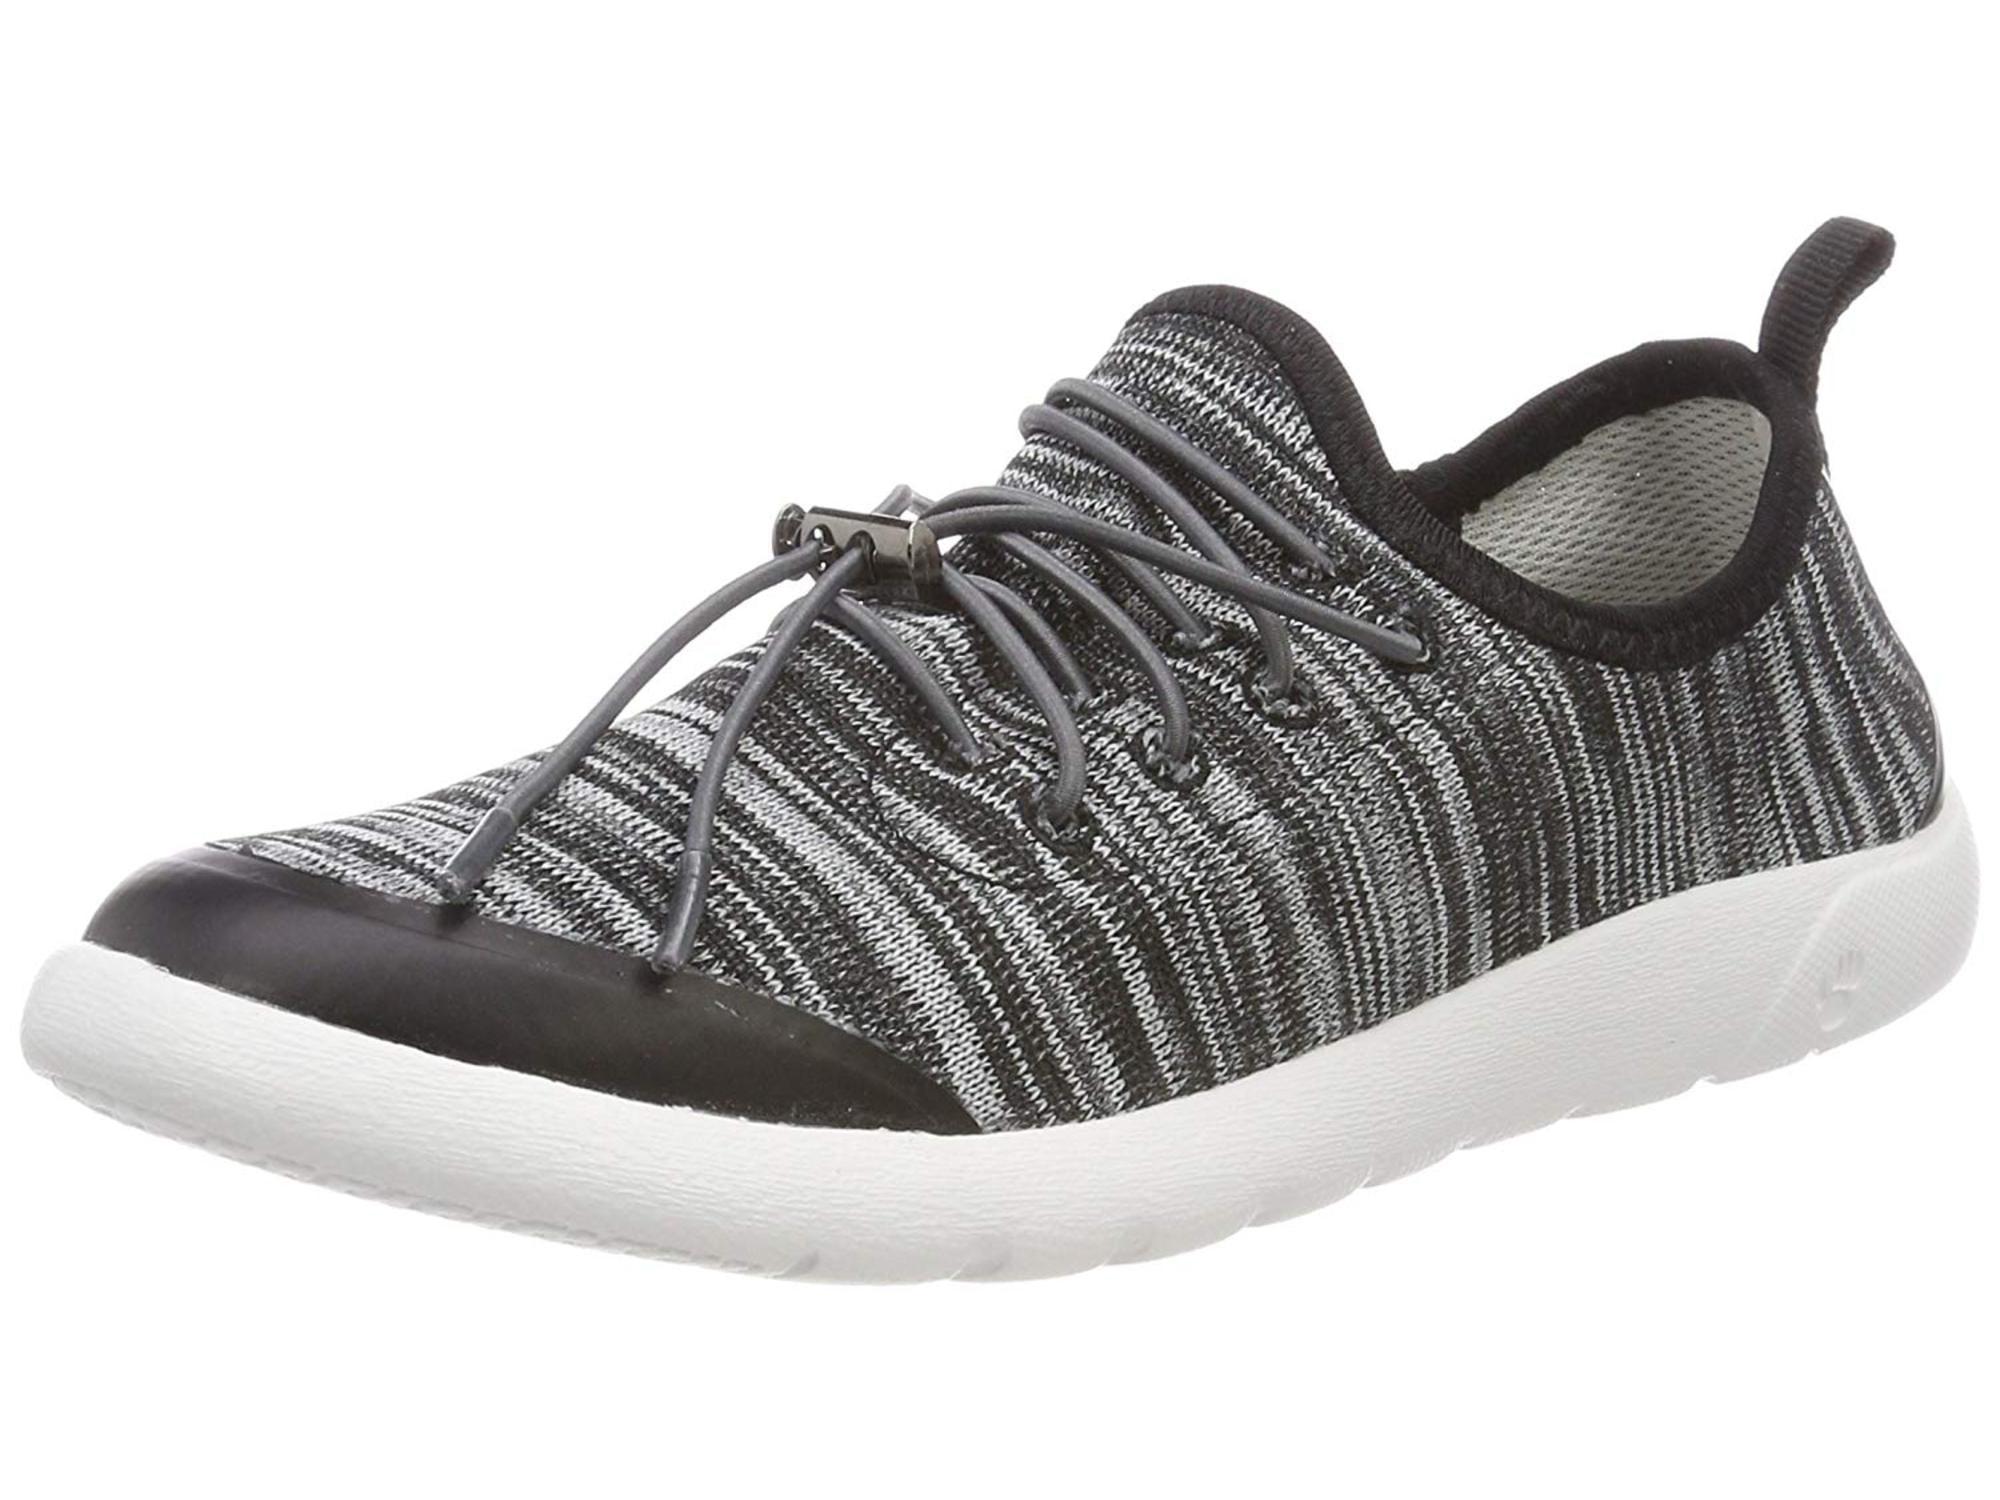 b34a6503d7a Bearpaw Womens Irene Low Top Bungee Fashion Sneakers